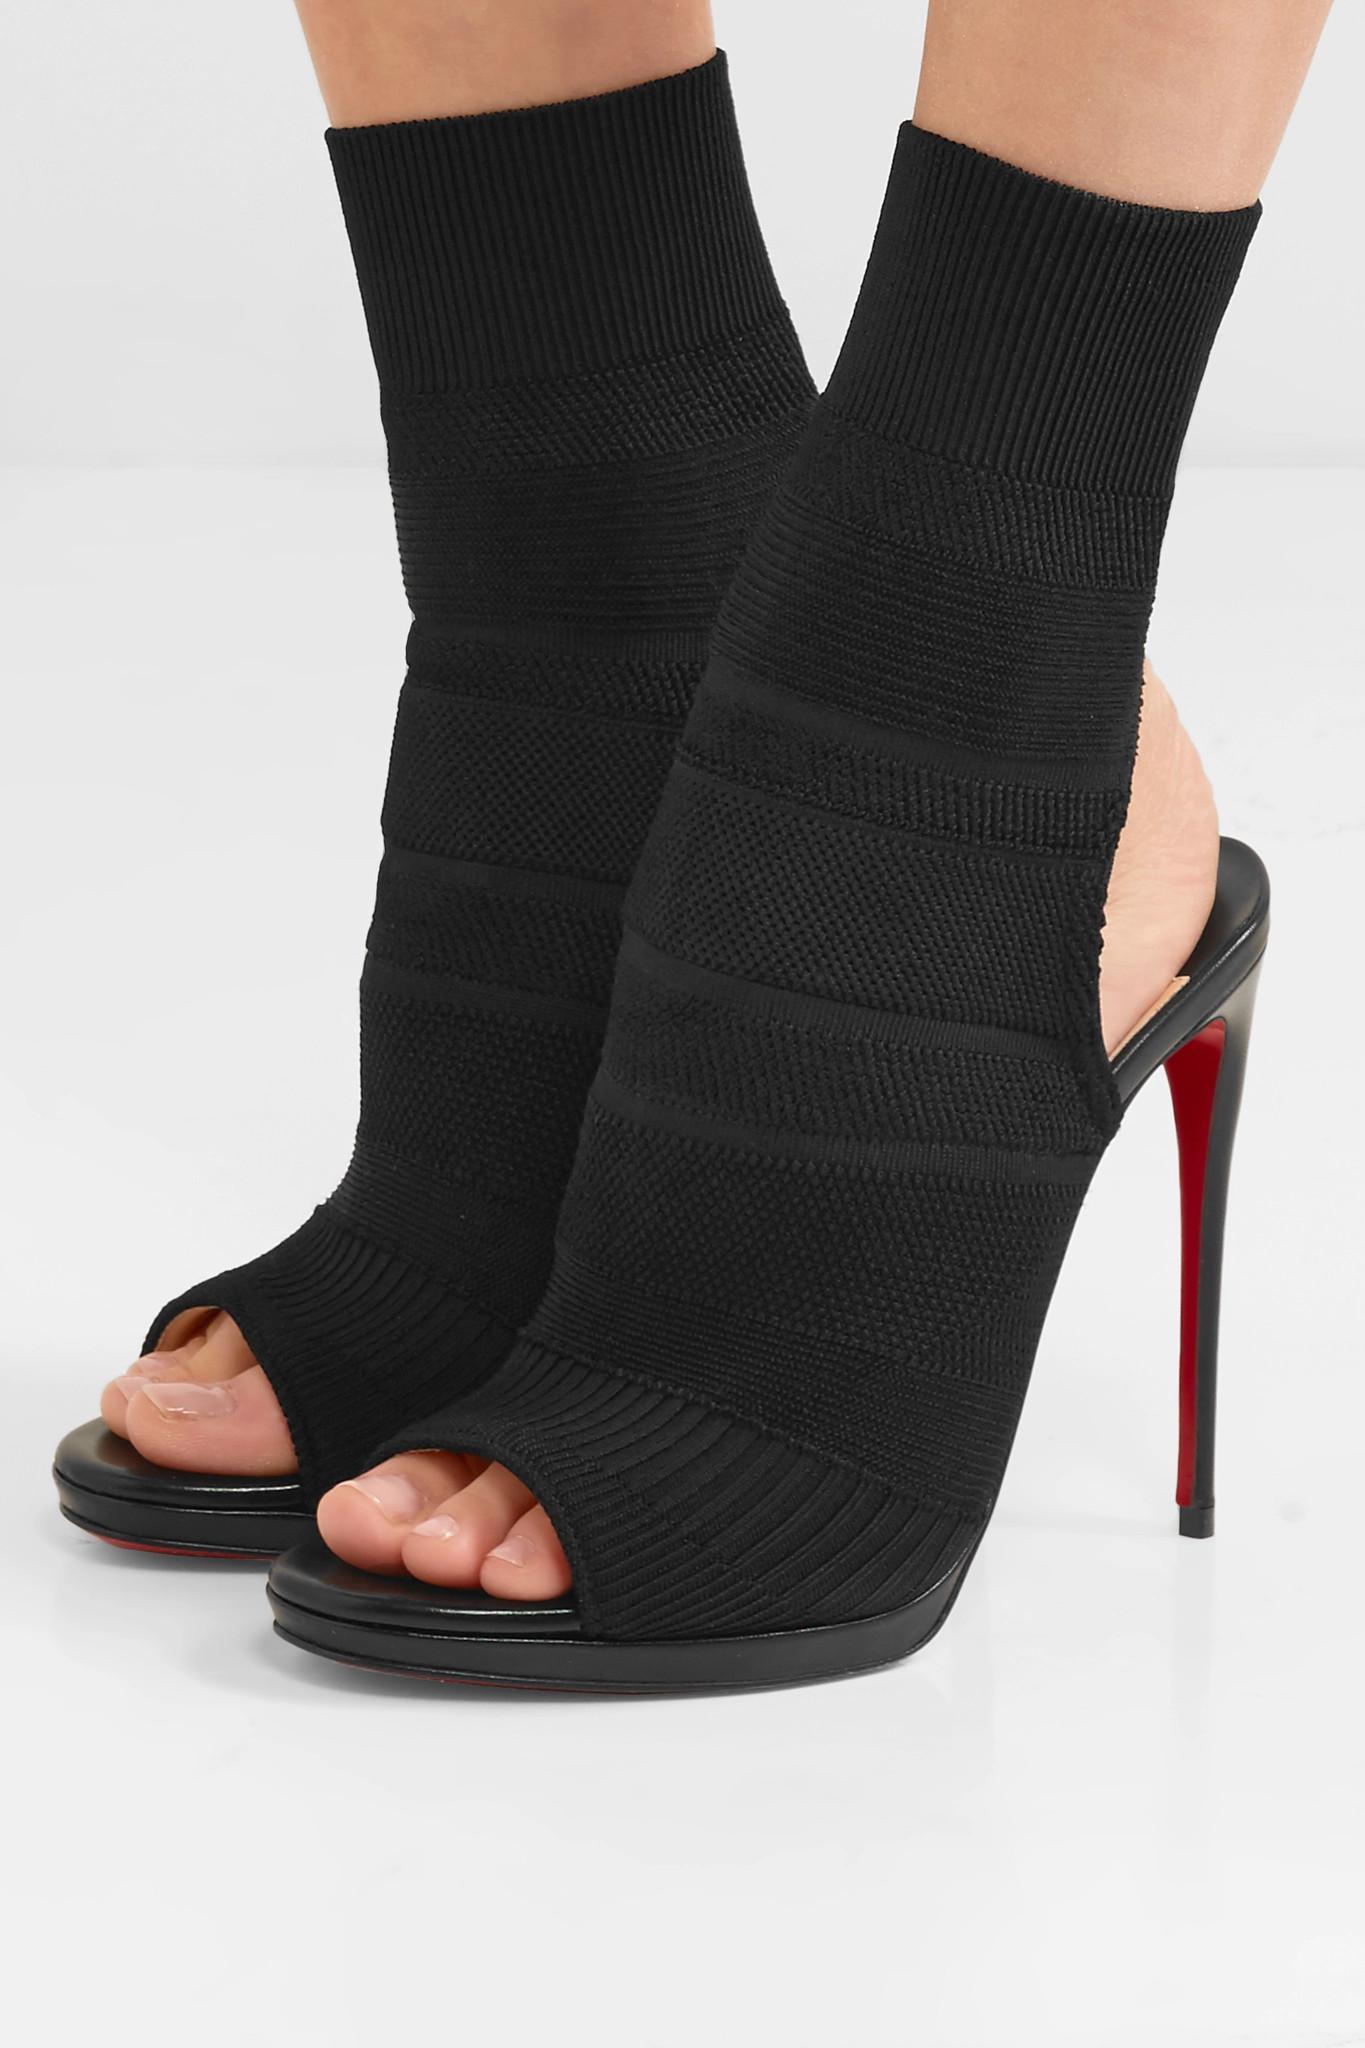 e9e60028670 Christian Louboutin Black Cheminene 120 Cutout Stretch-knit Sock Boots